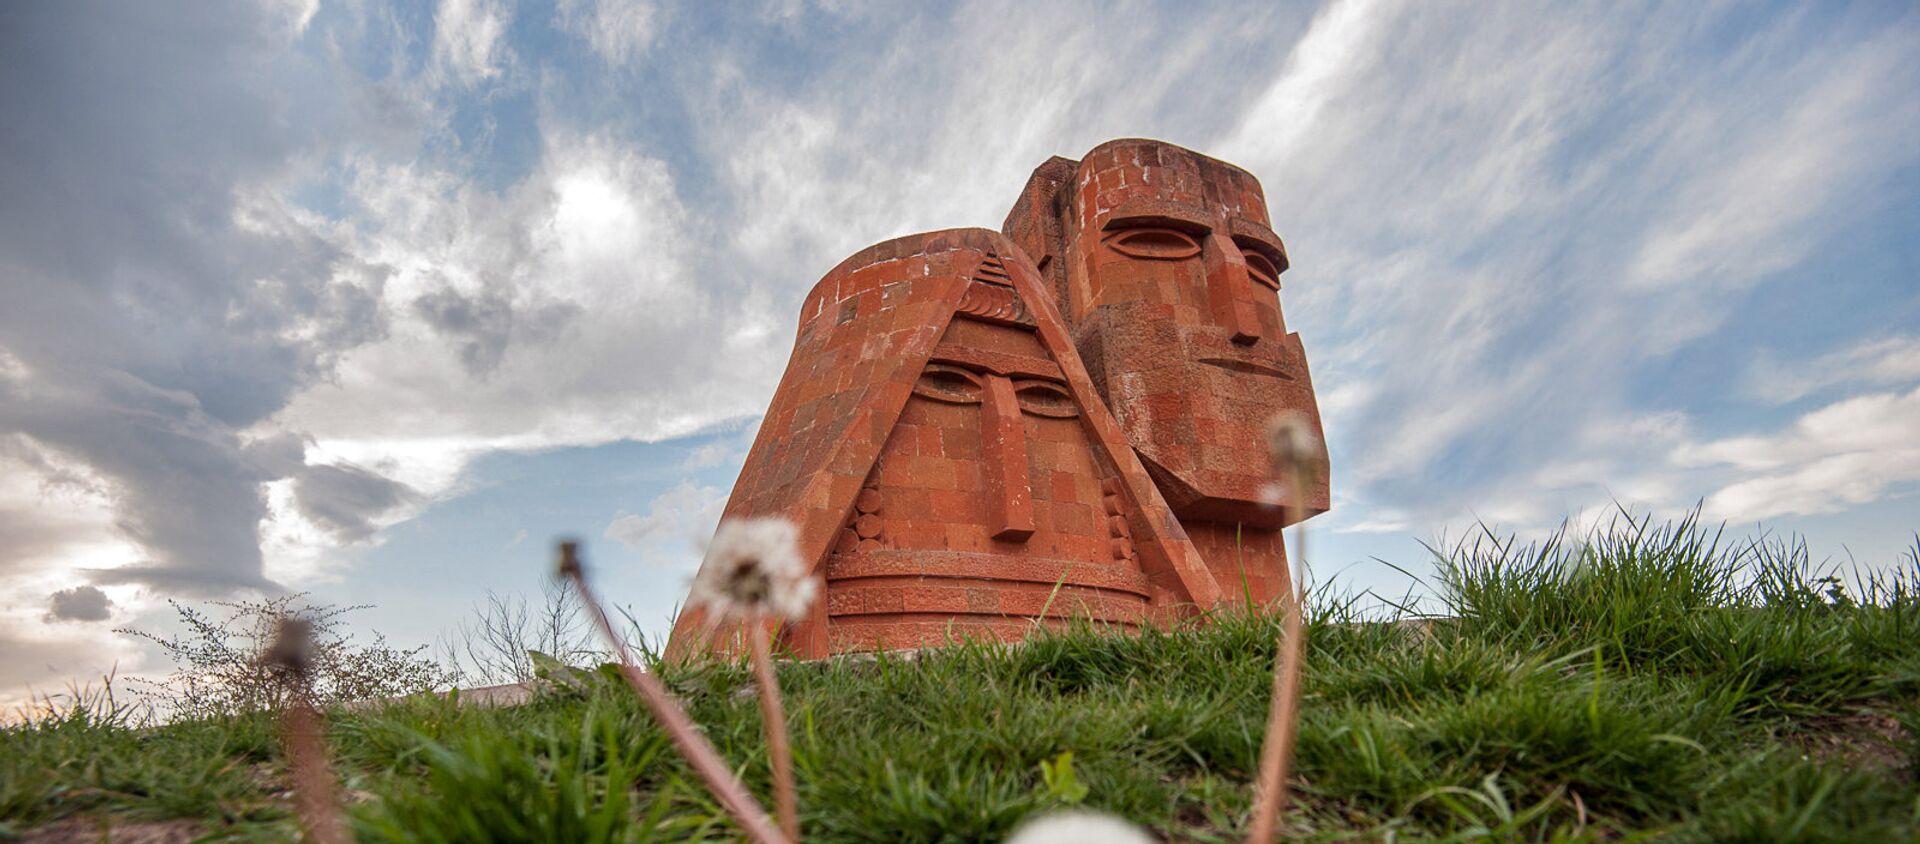 Памятник Мы-наши горы. Степанакерт. НКР - Sputnik Արմենիա, 1920, 22.03.2021